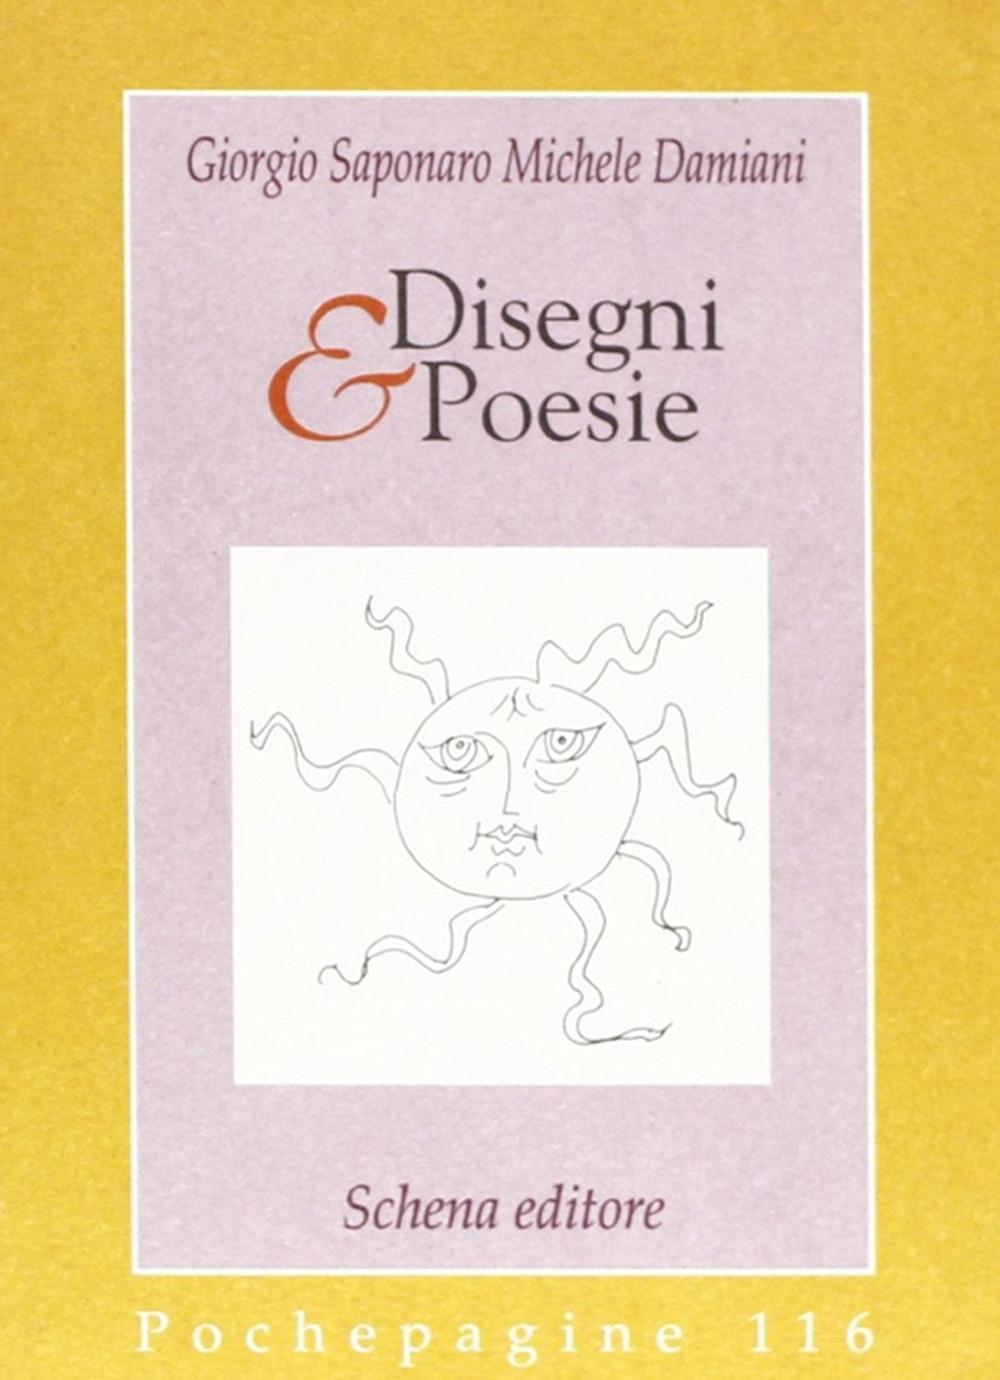 Disegni & poesie